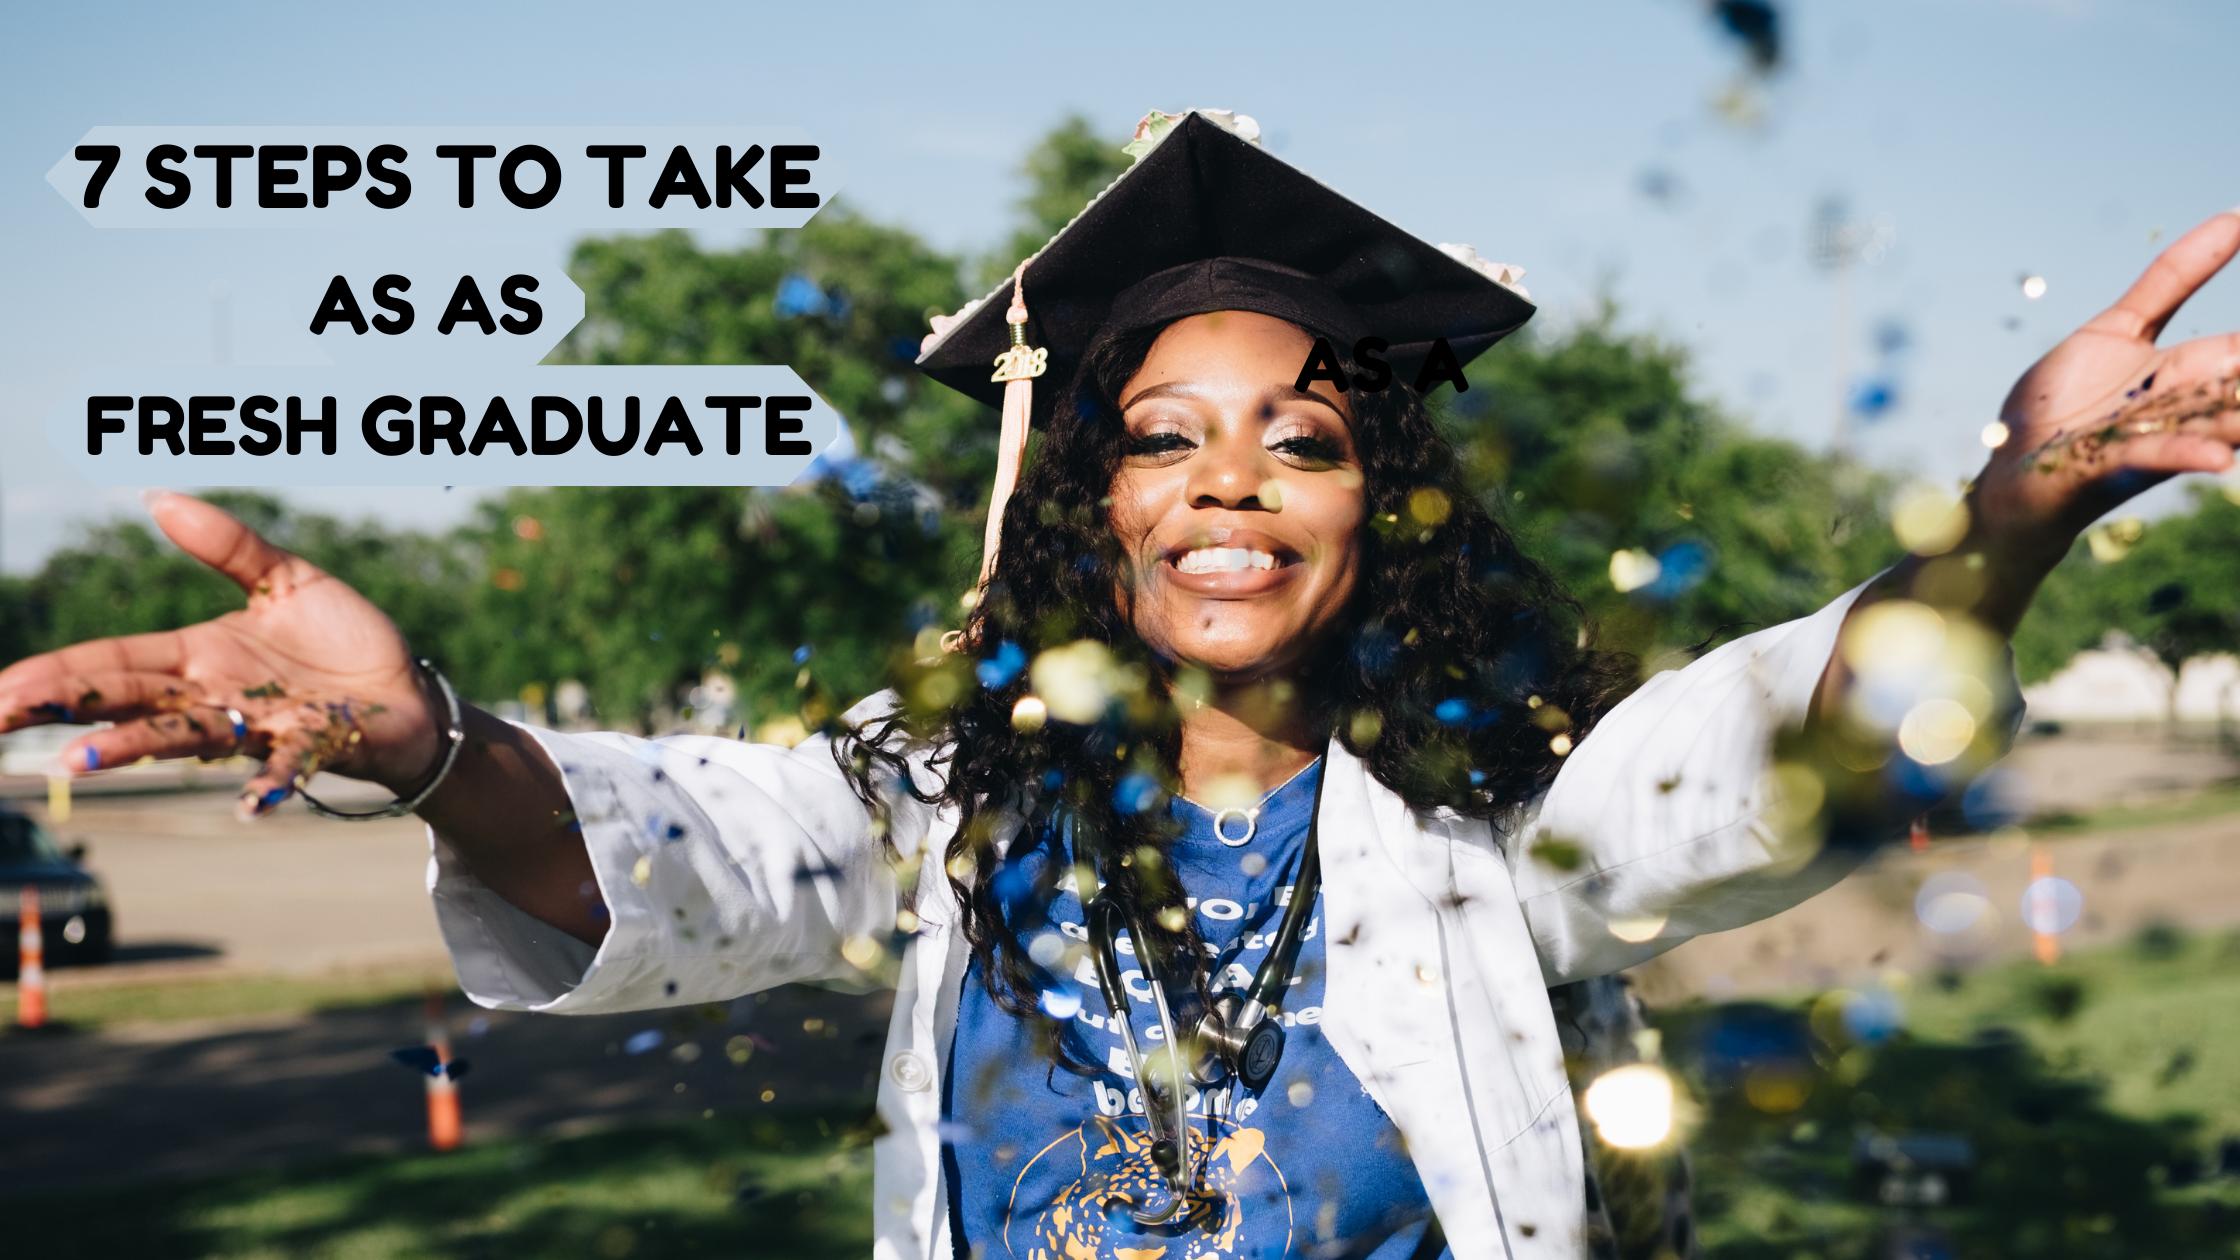 7 Steps To Take As A Fresh Graduate